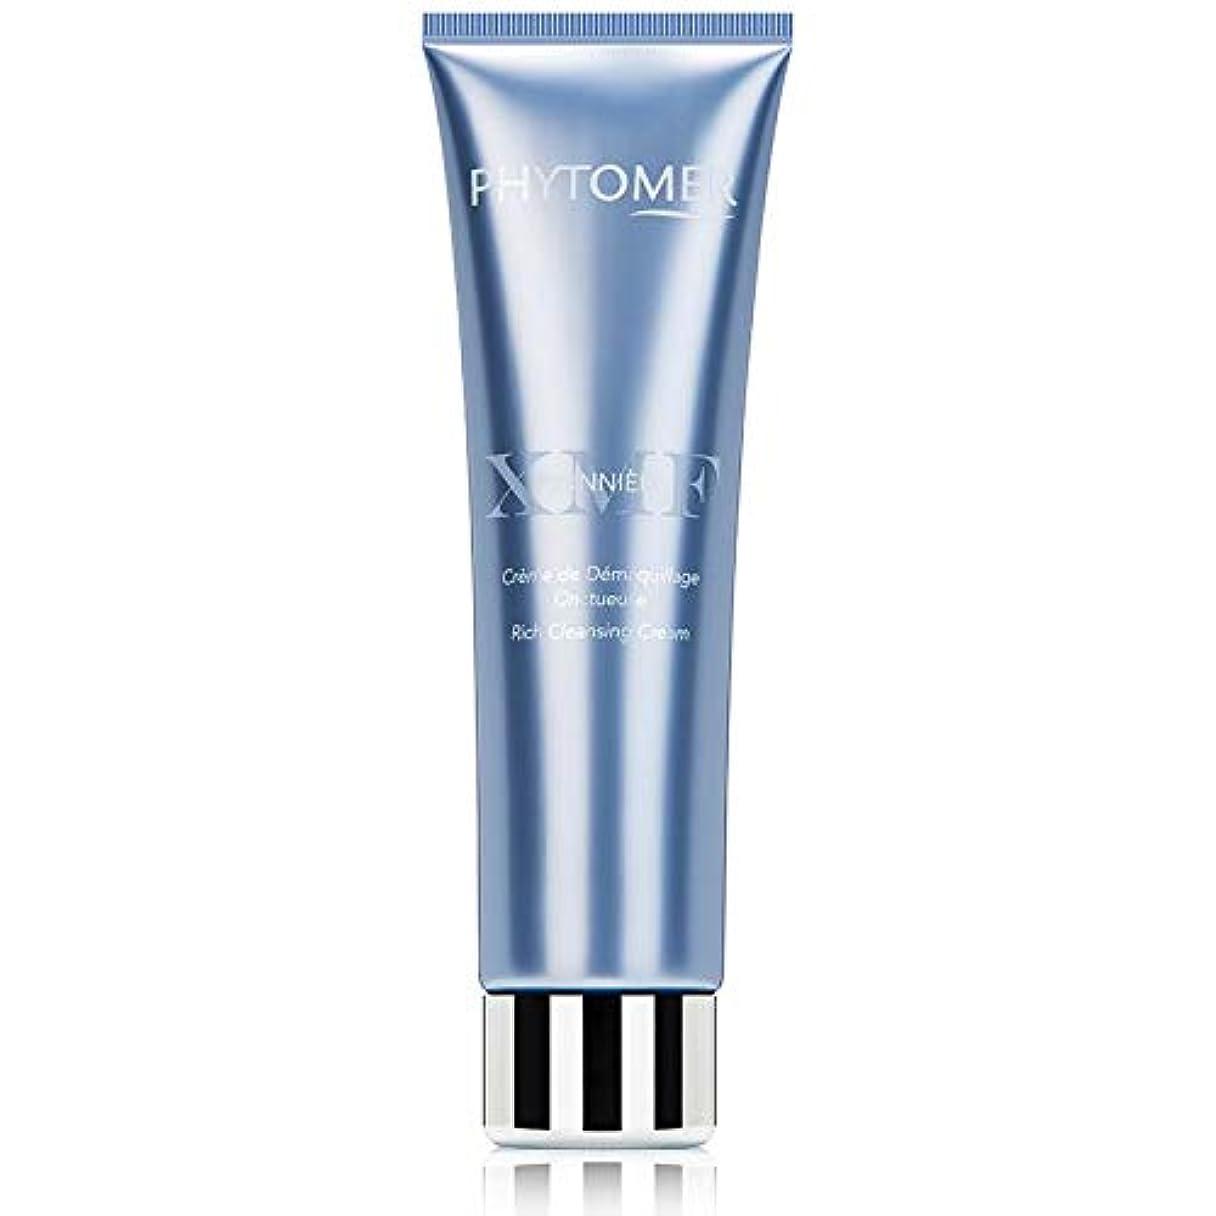 指弁護人不公平Phytomer Pionniere XMF Rich Cleansing Cream 150ml並行輸入品